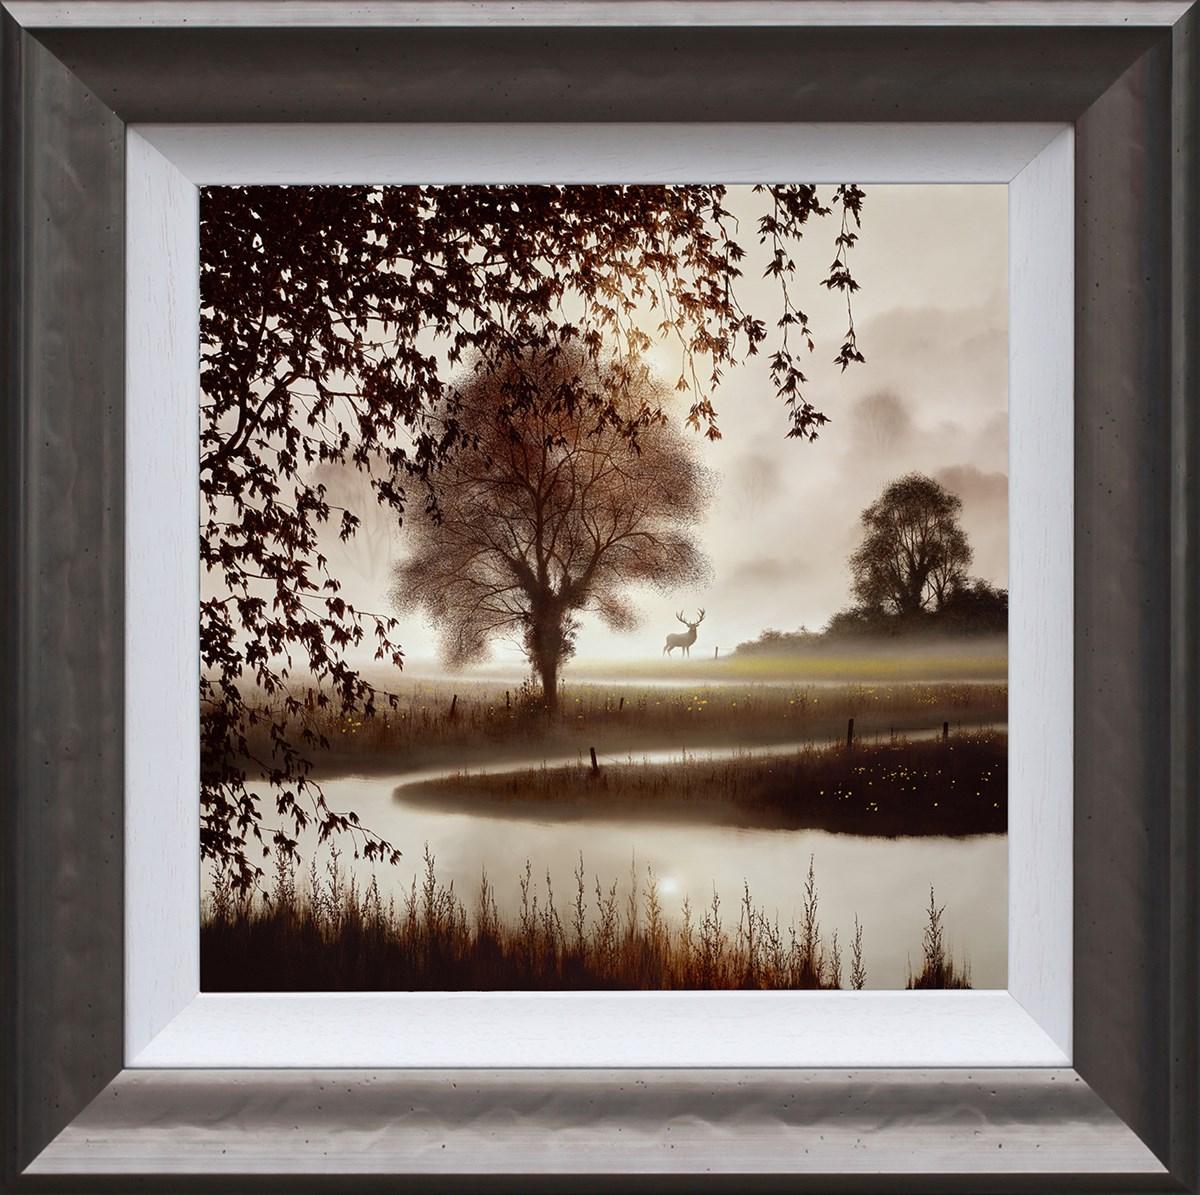 Stillness of time by John Waterhouse